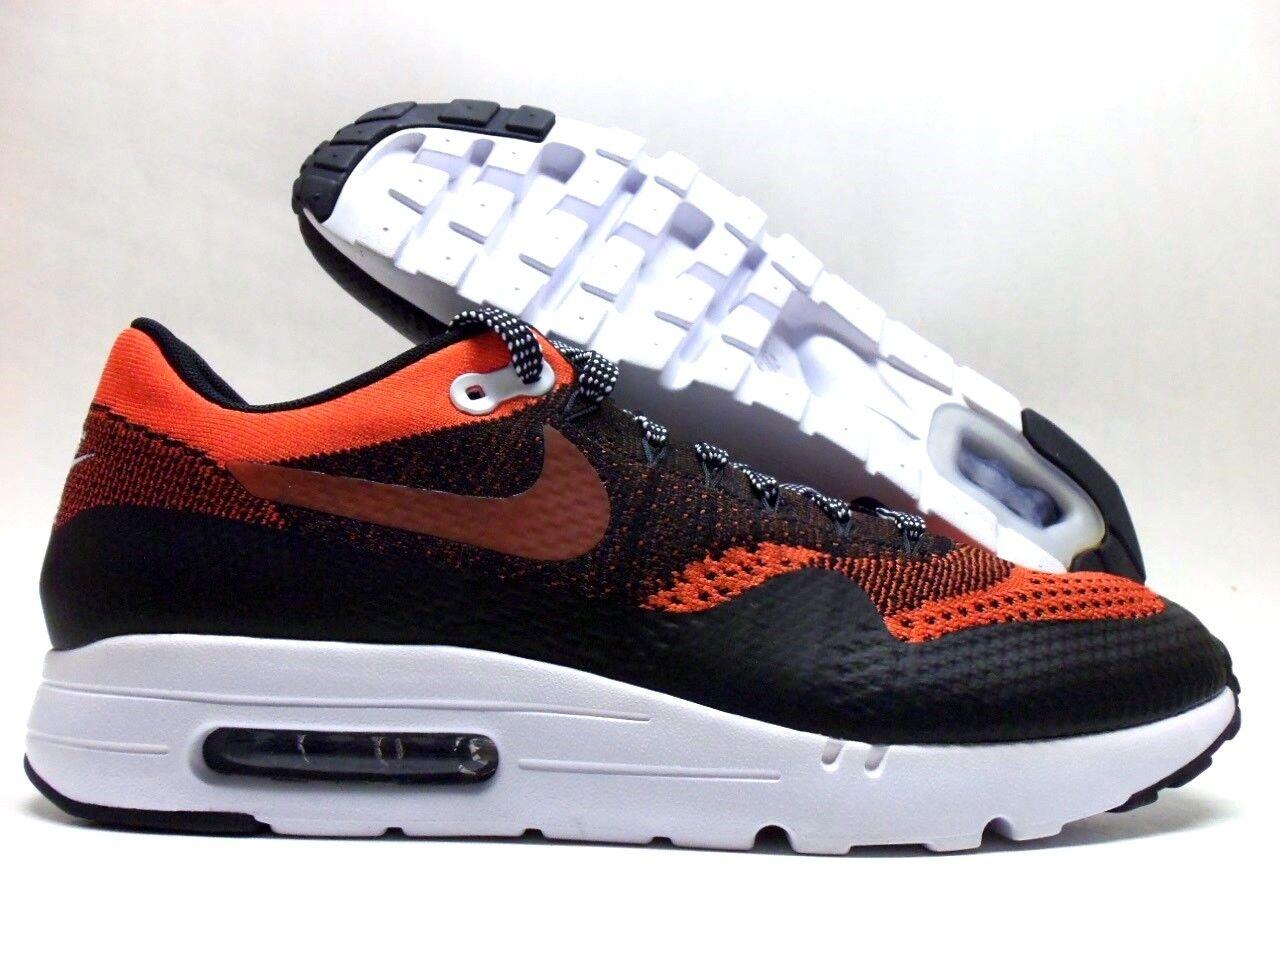 nike air id max 1 ultra flyknit id air orange / black-white größe männer 10,5 bae512